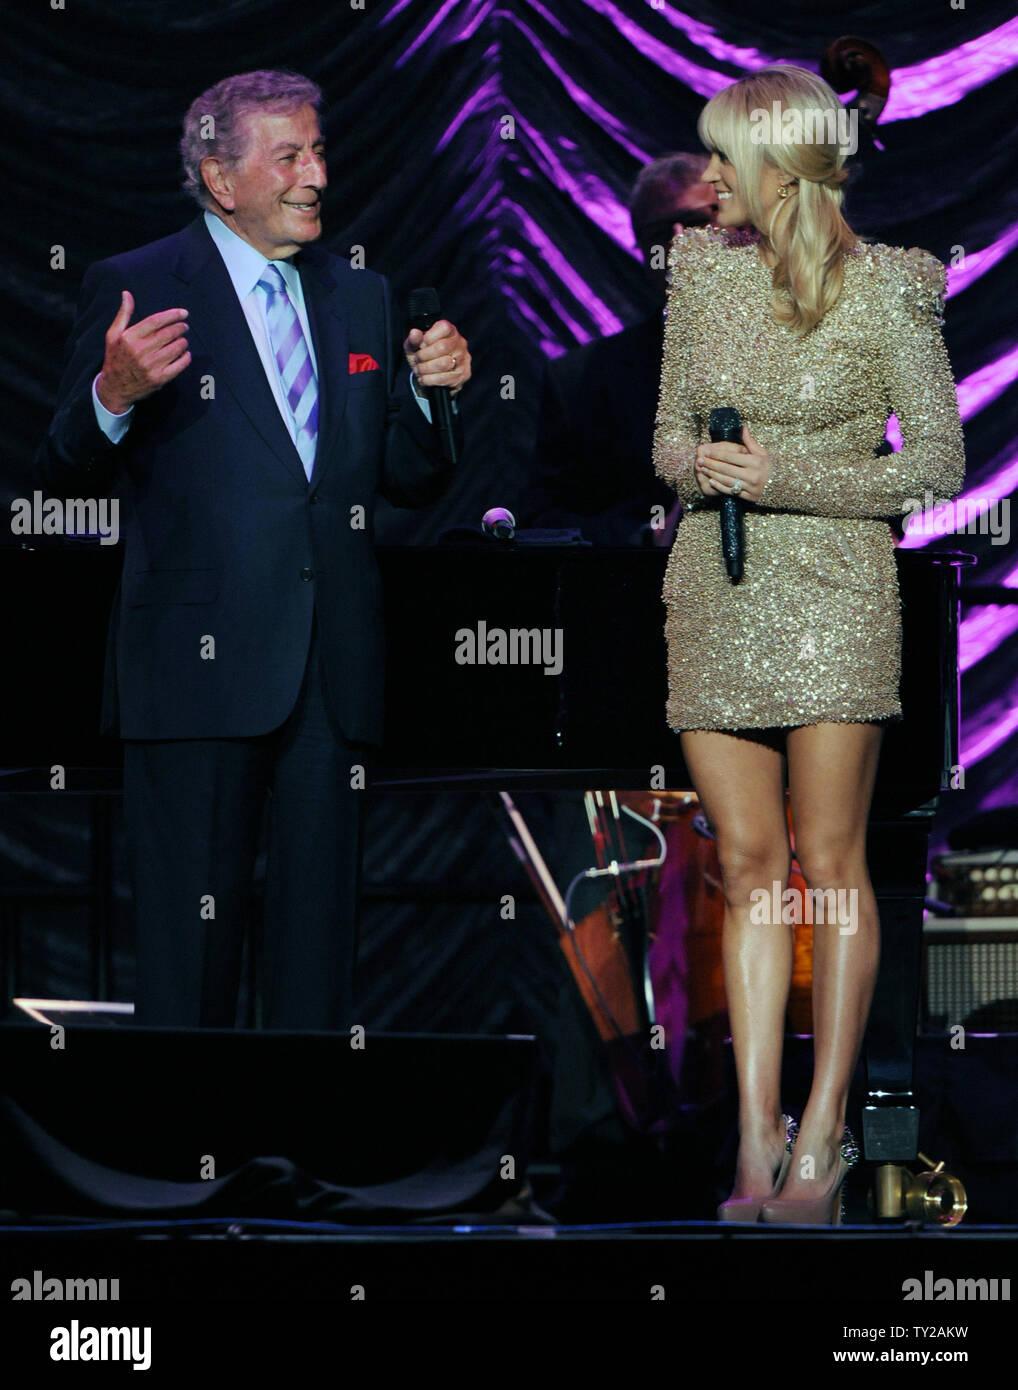 rencontres Carrie Underwood rencontres NFL joueurs